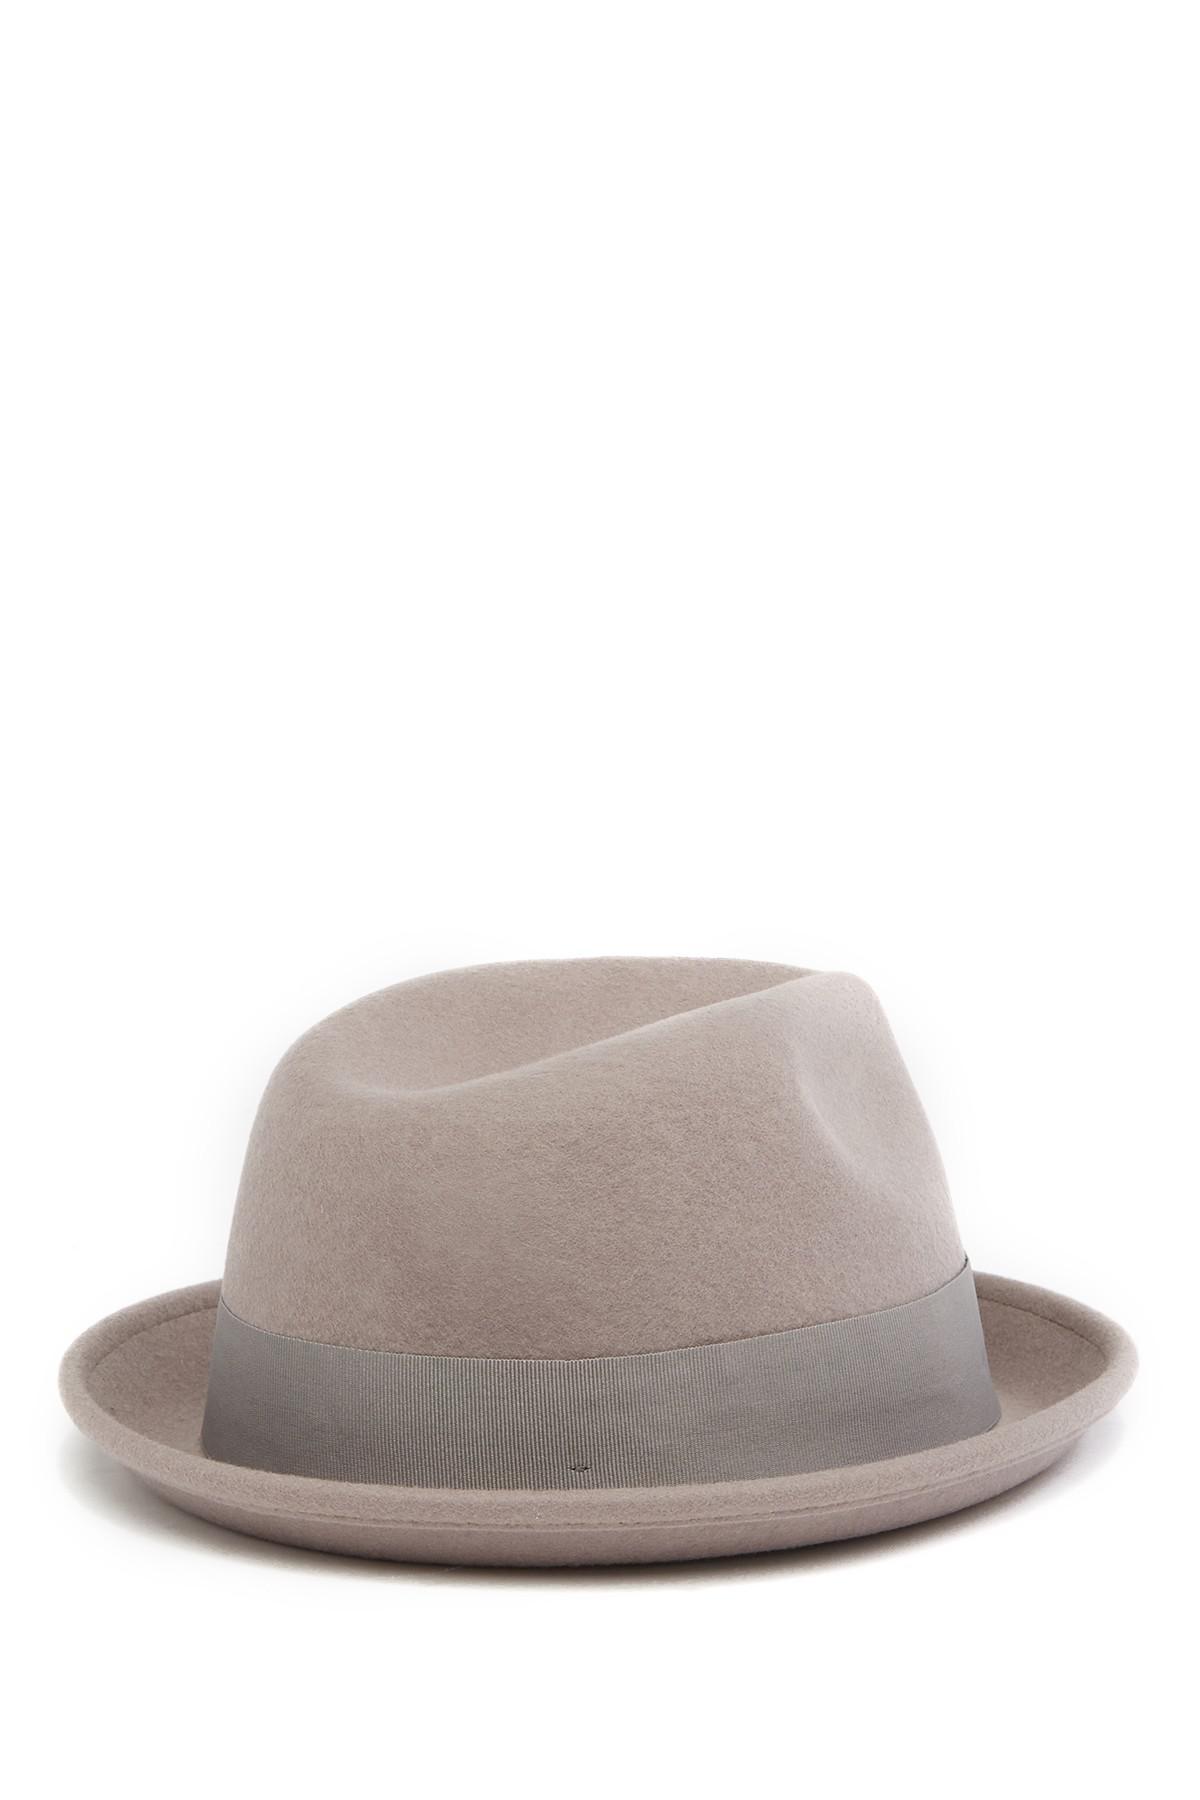 02e9bf1cd7854f Goorin Bros The Good Boy Felt Wool Fedora in Gray for Men - Lyst